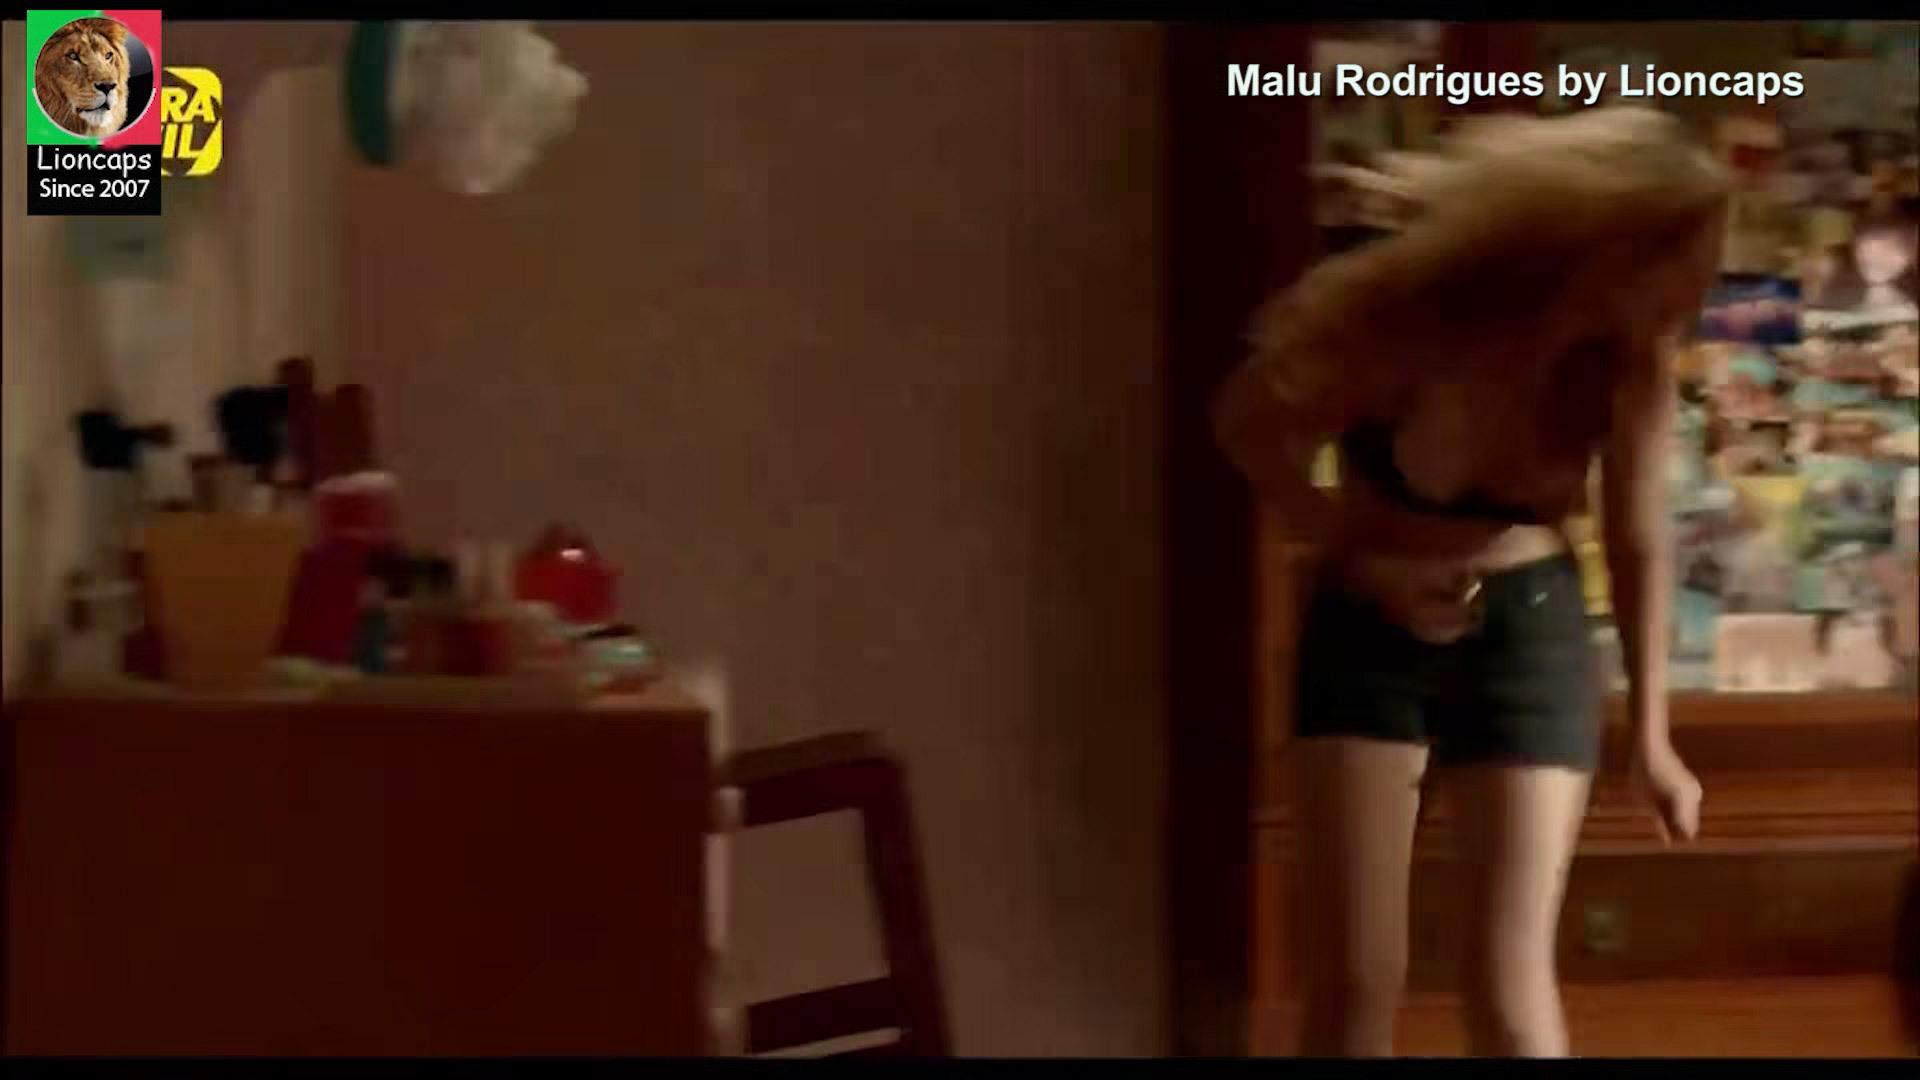 malu_rodrigues_confissoes_adolescente_lioncaps_29_11_2020 (3).jpg